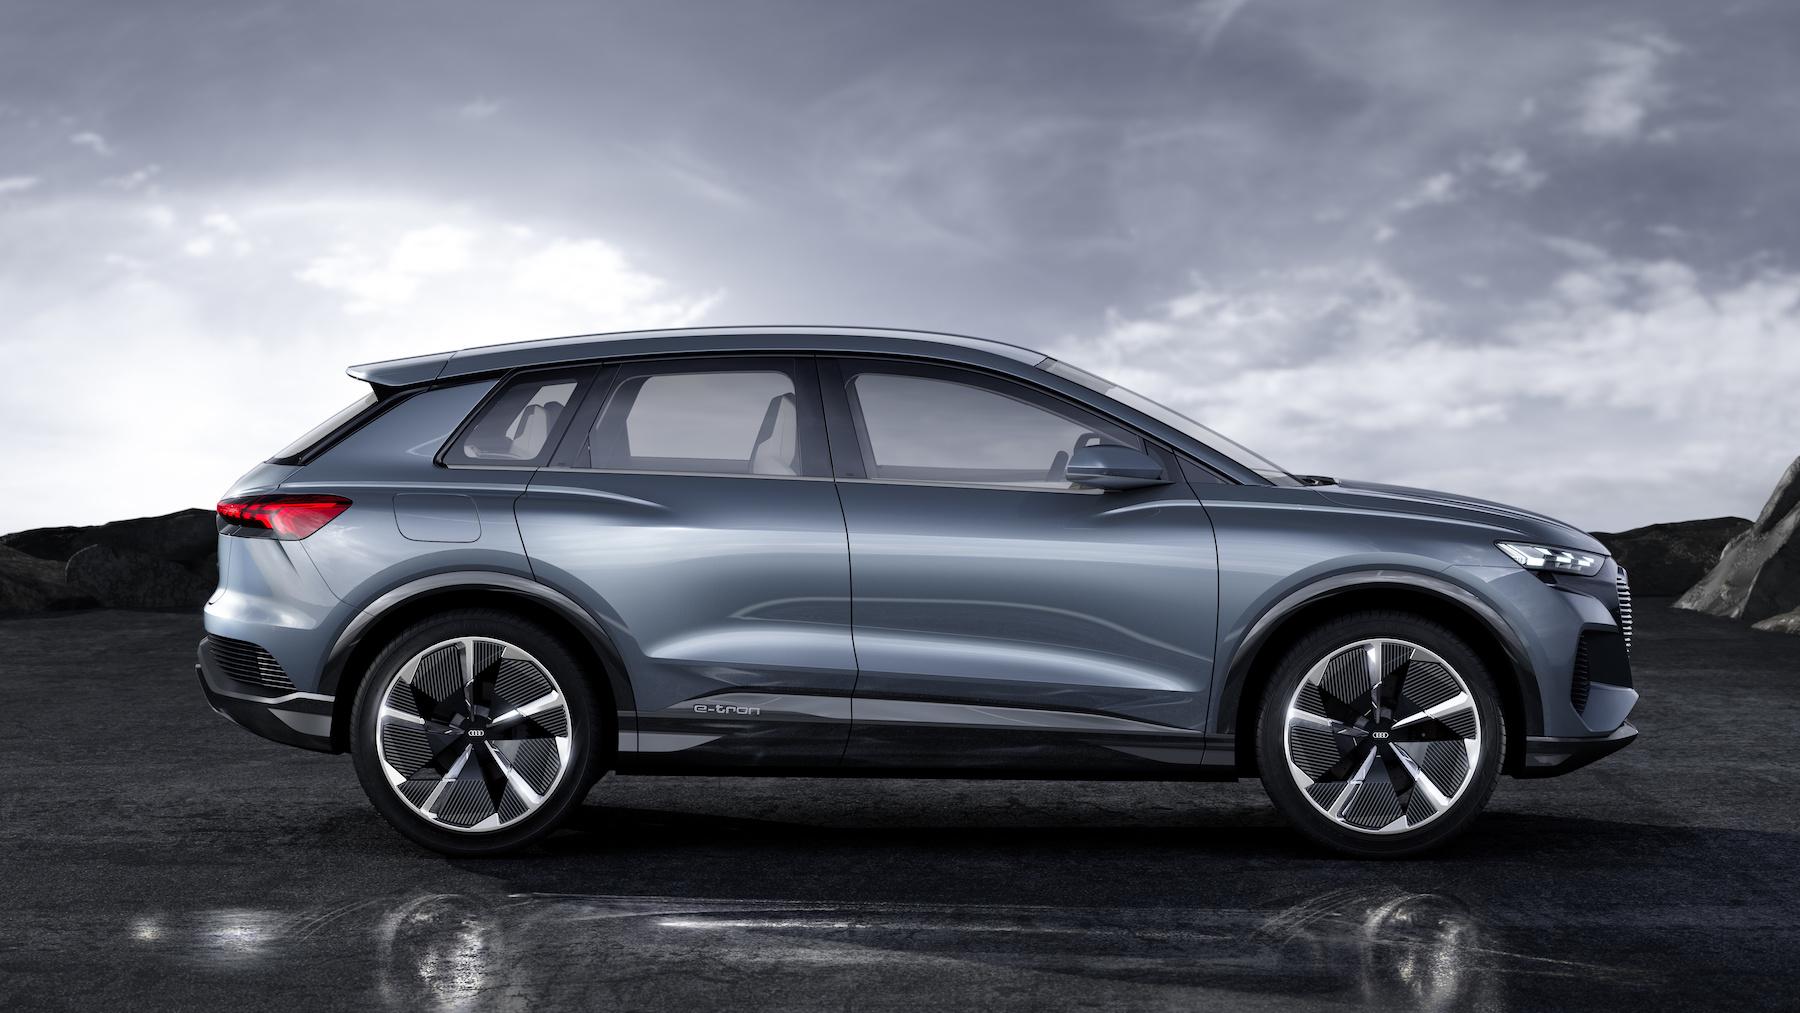 Markante Kotflügel, sportliche Dachlinie: Der Audi Q4 e-tron concept kommt dynamisch daher. (AUDI)